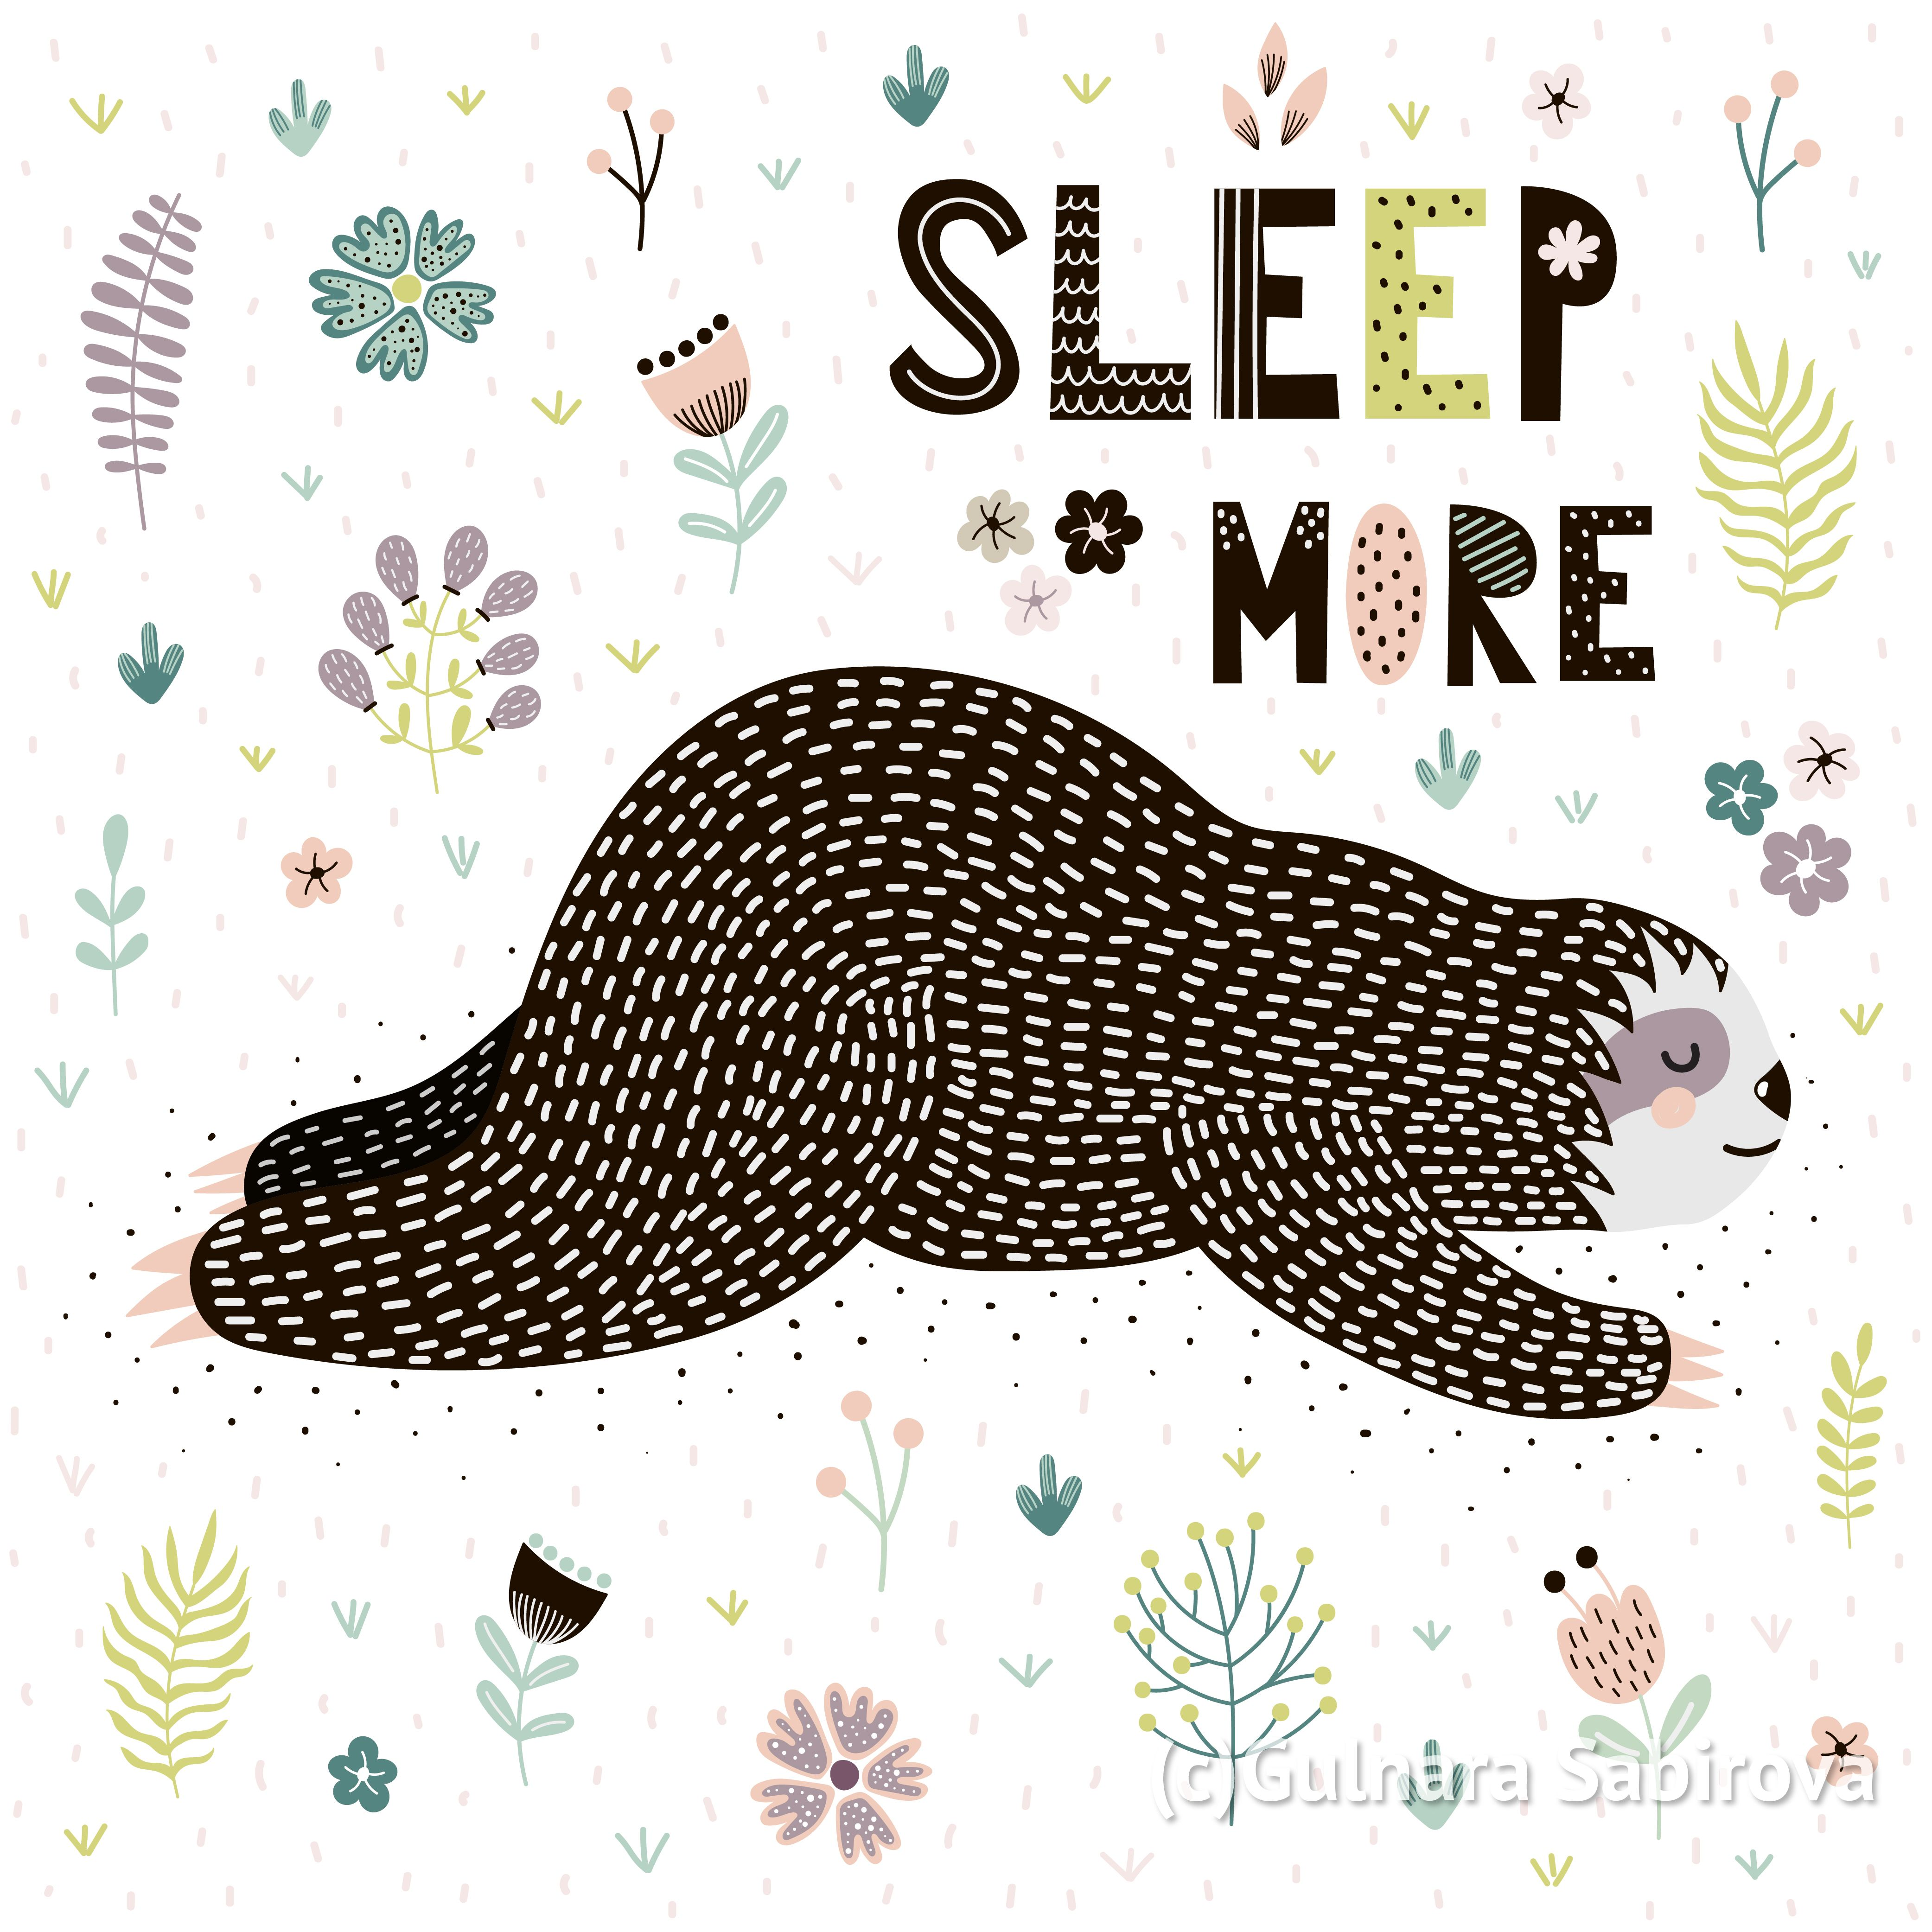 Cute sloths SVG clipart / Digital paper / Animals graphic